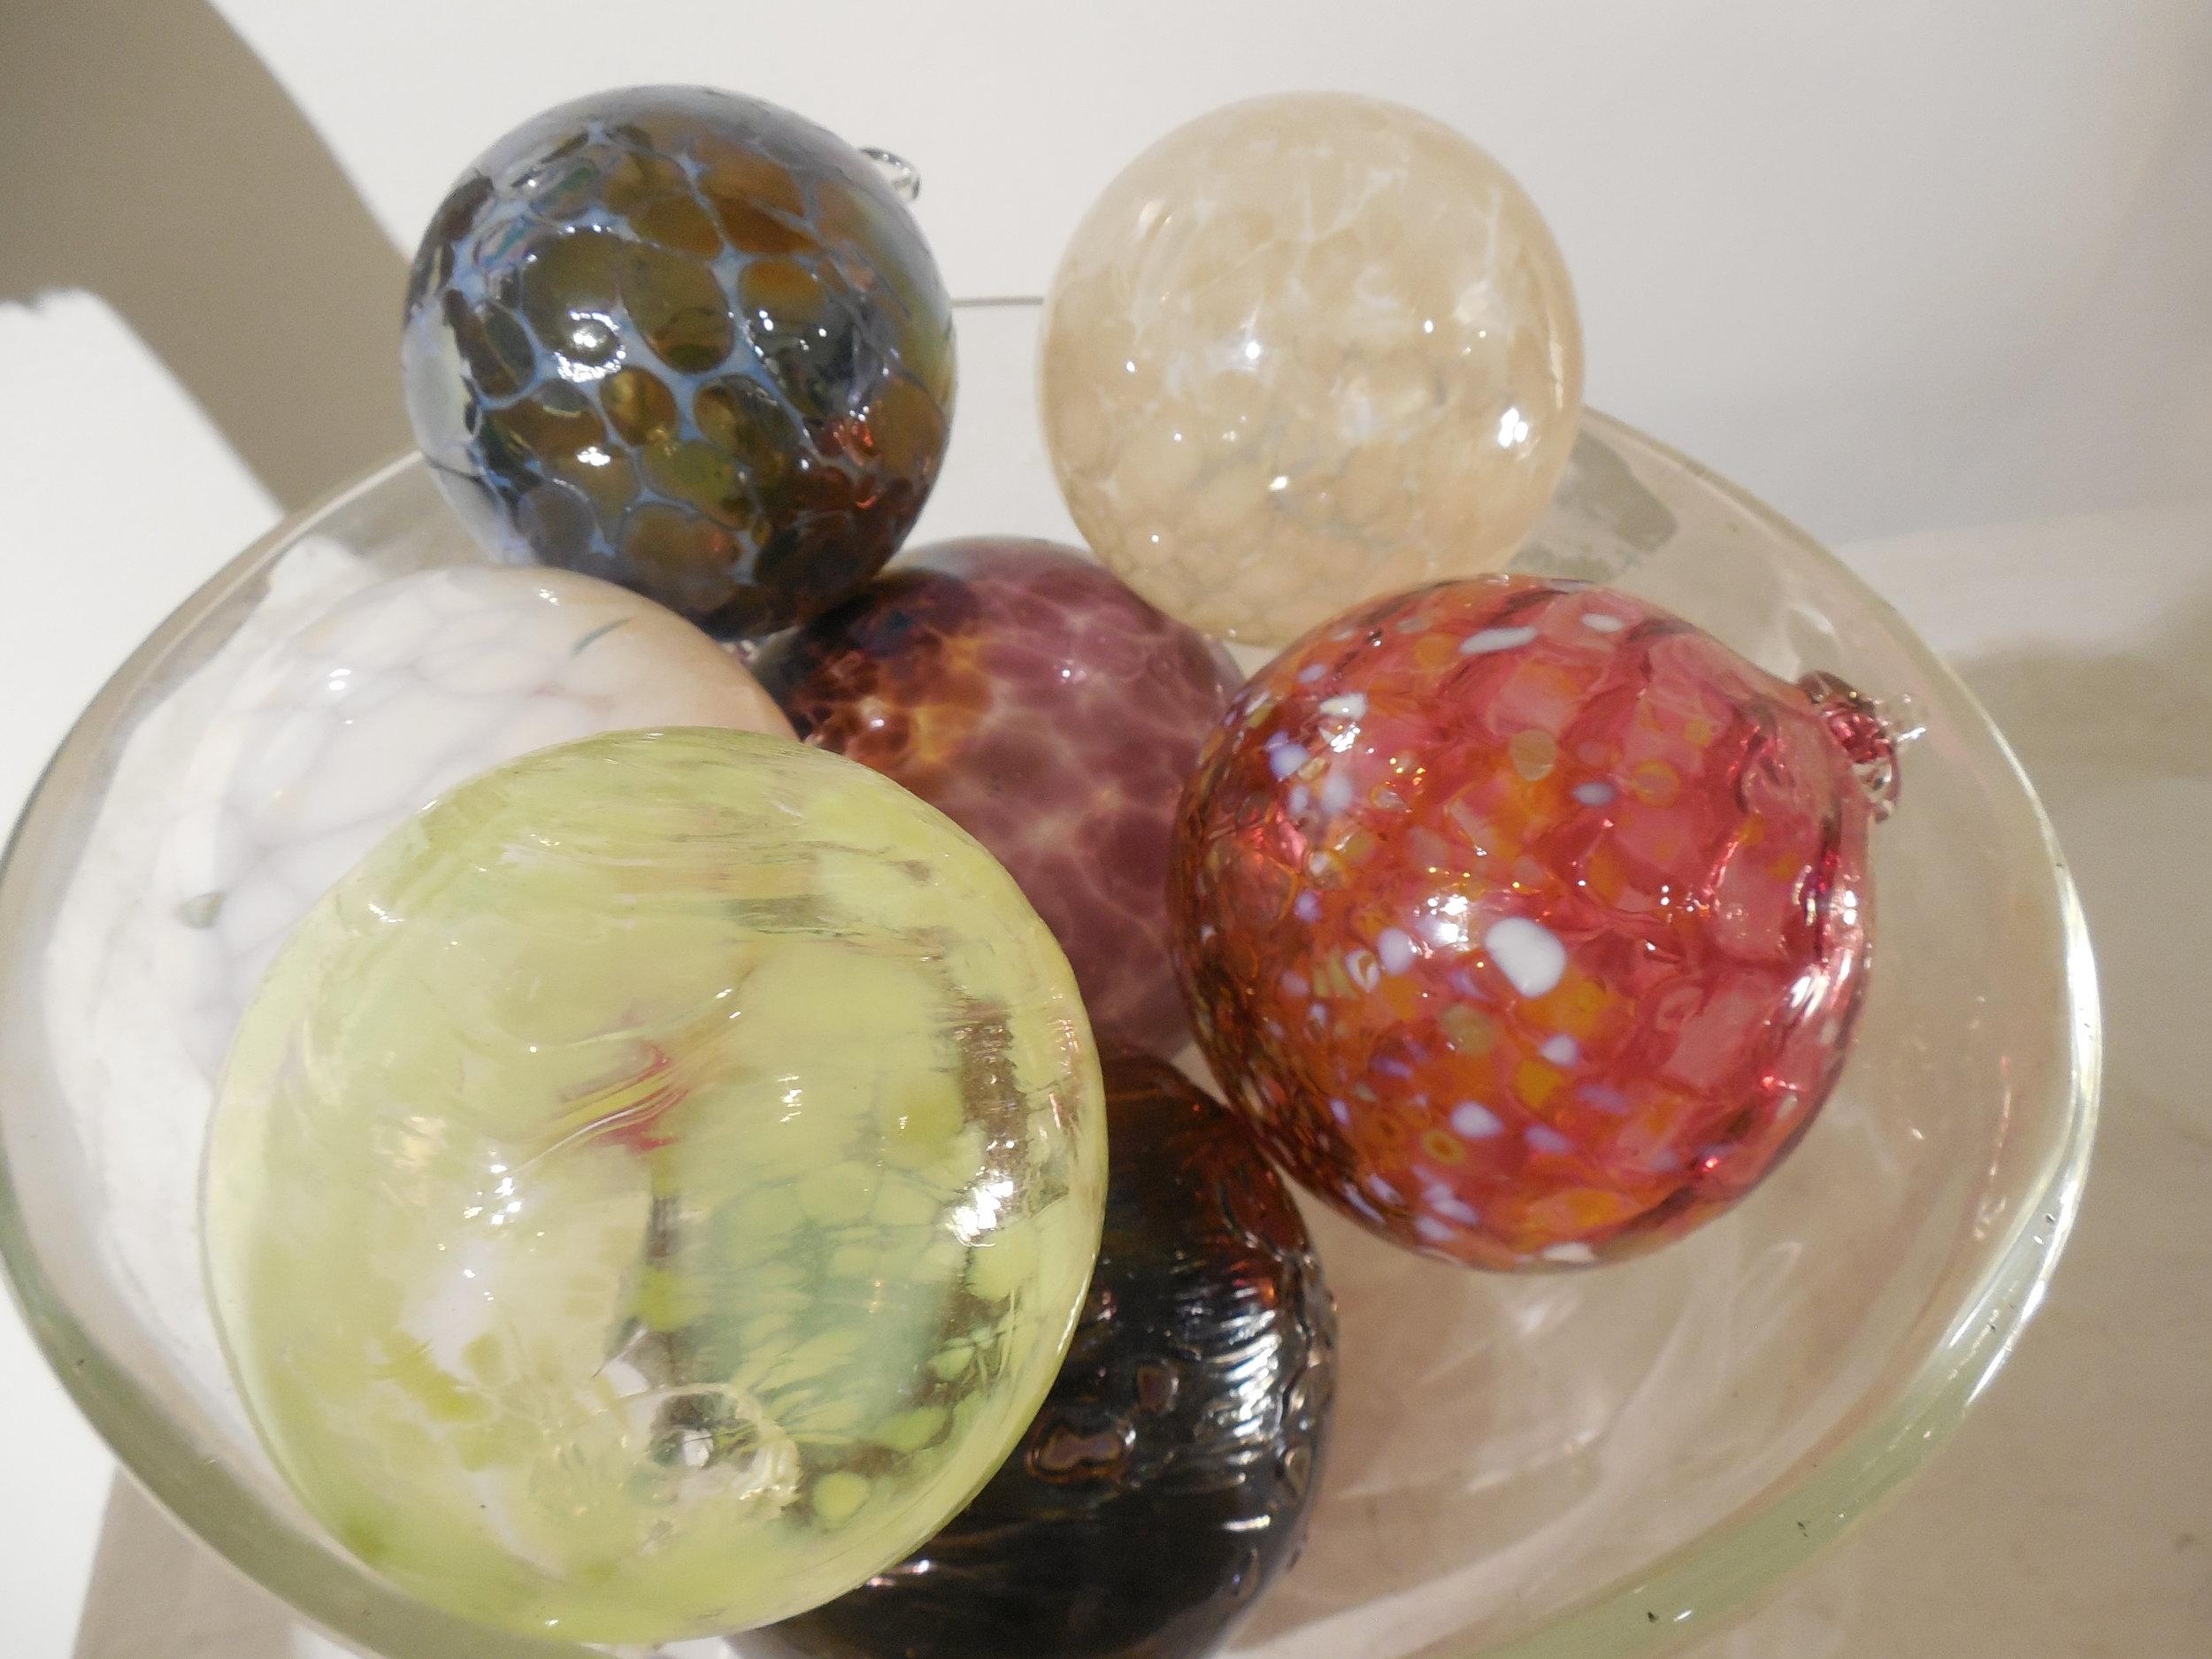 image 2 handblown glass by charles hall.JPG